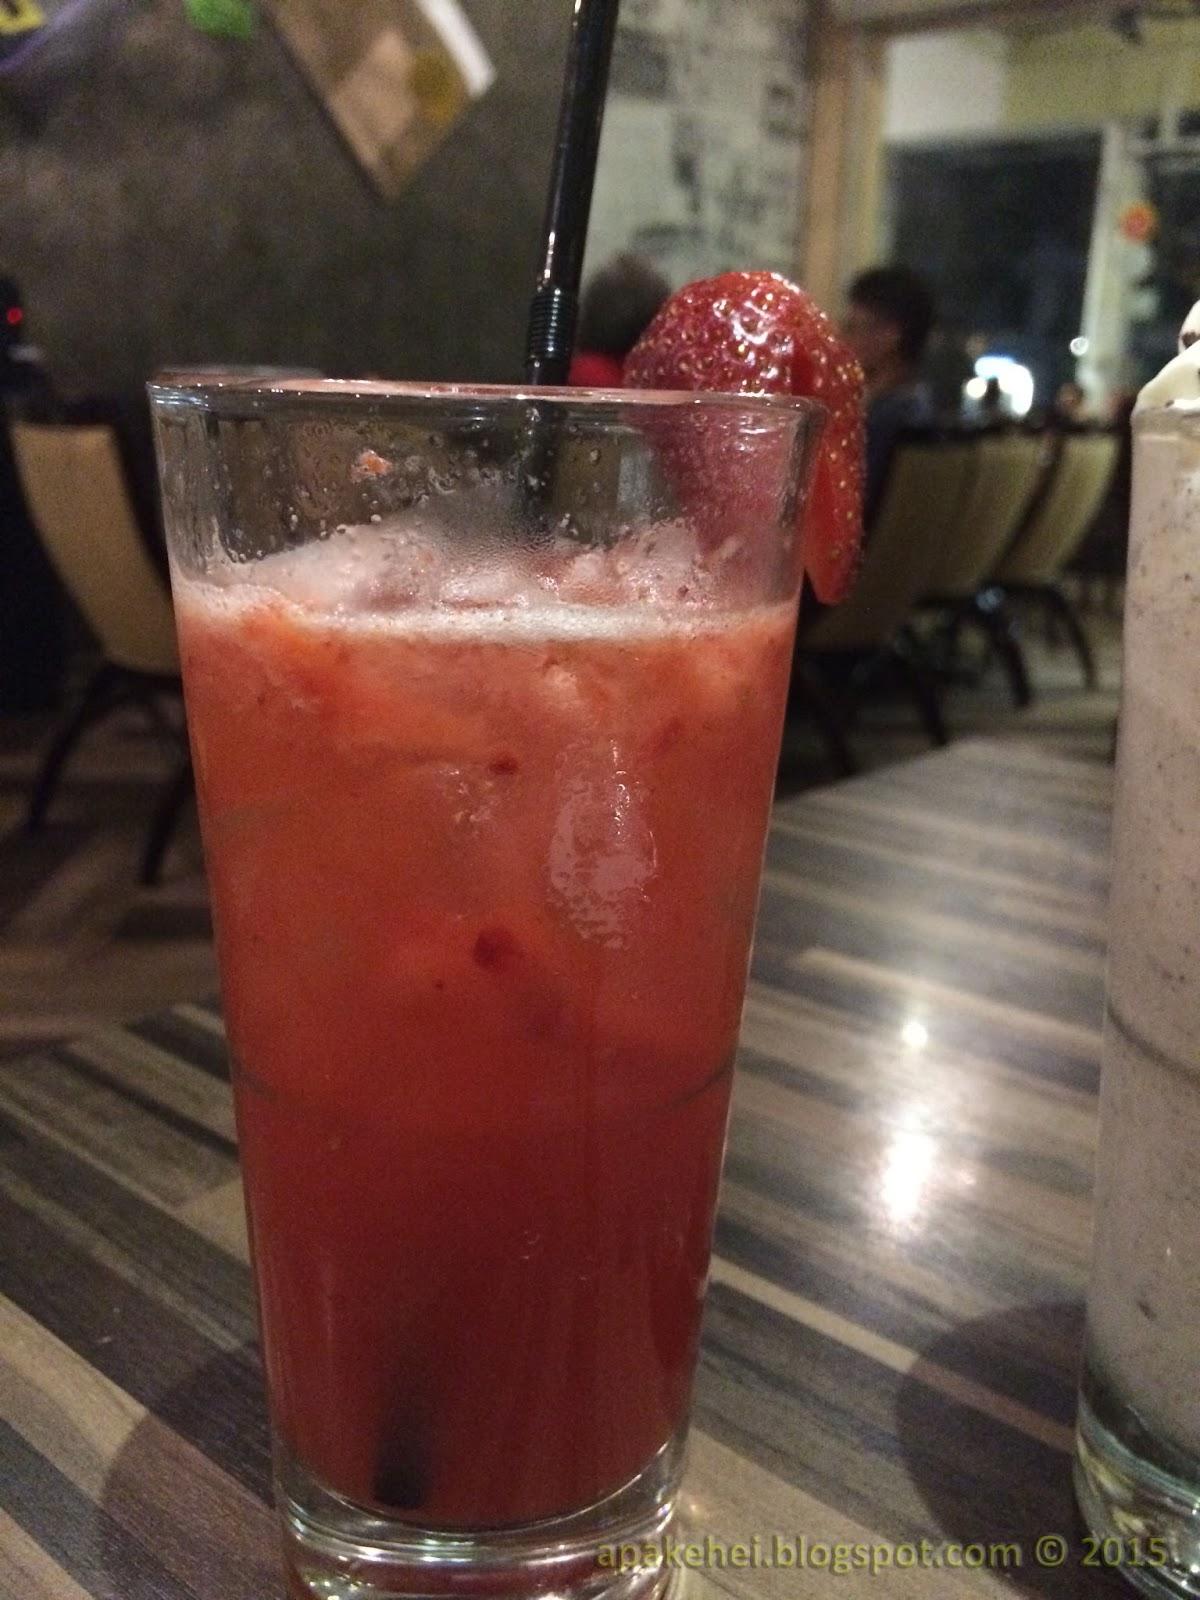 Strawberry jus